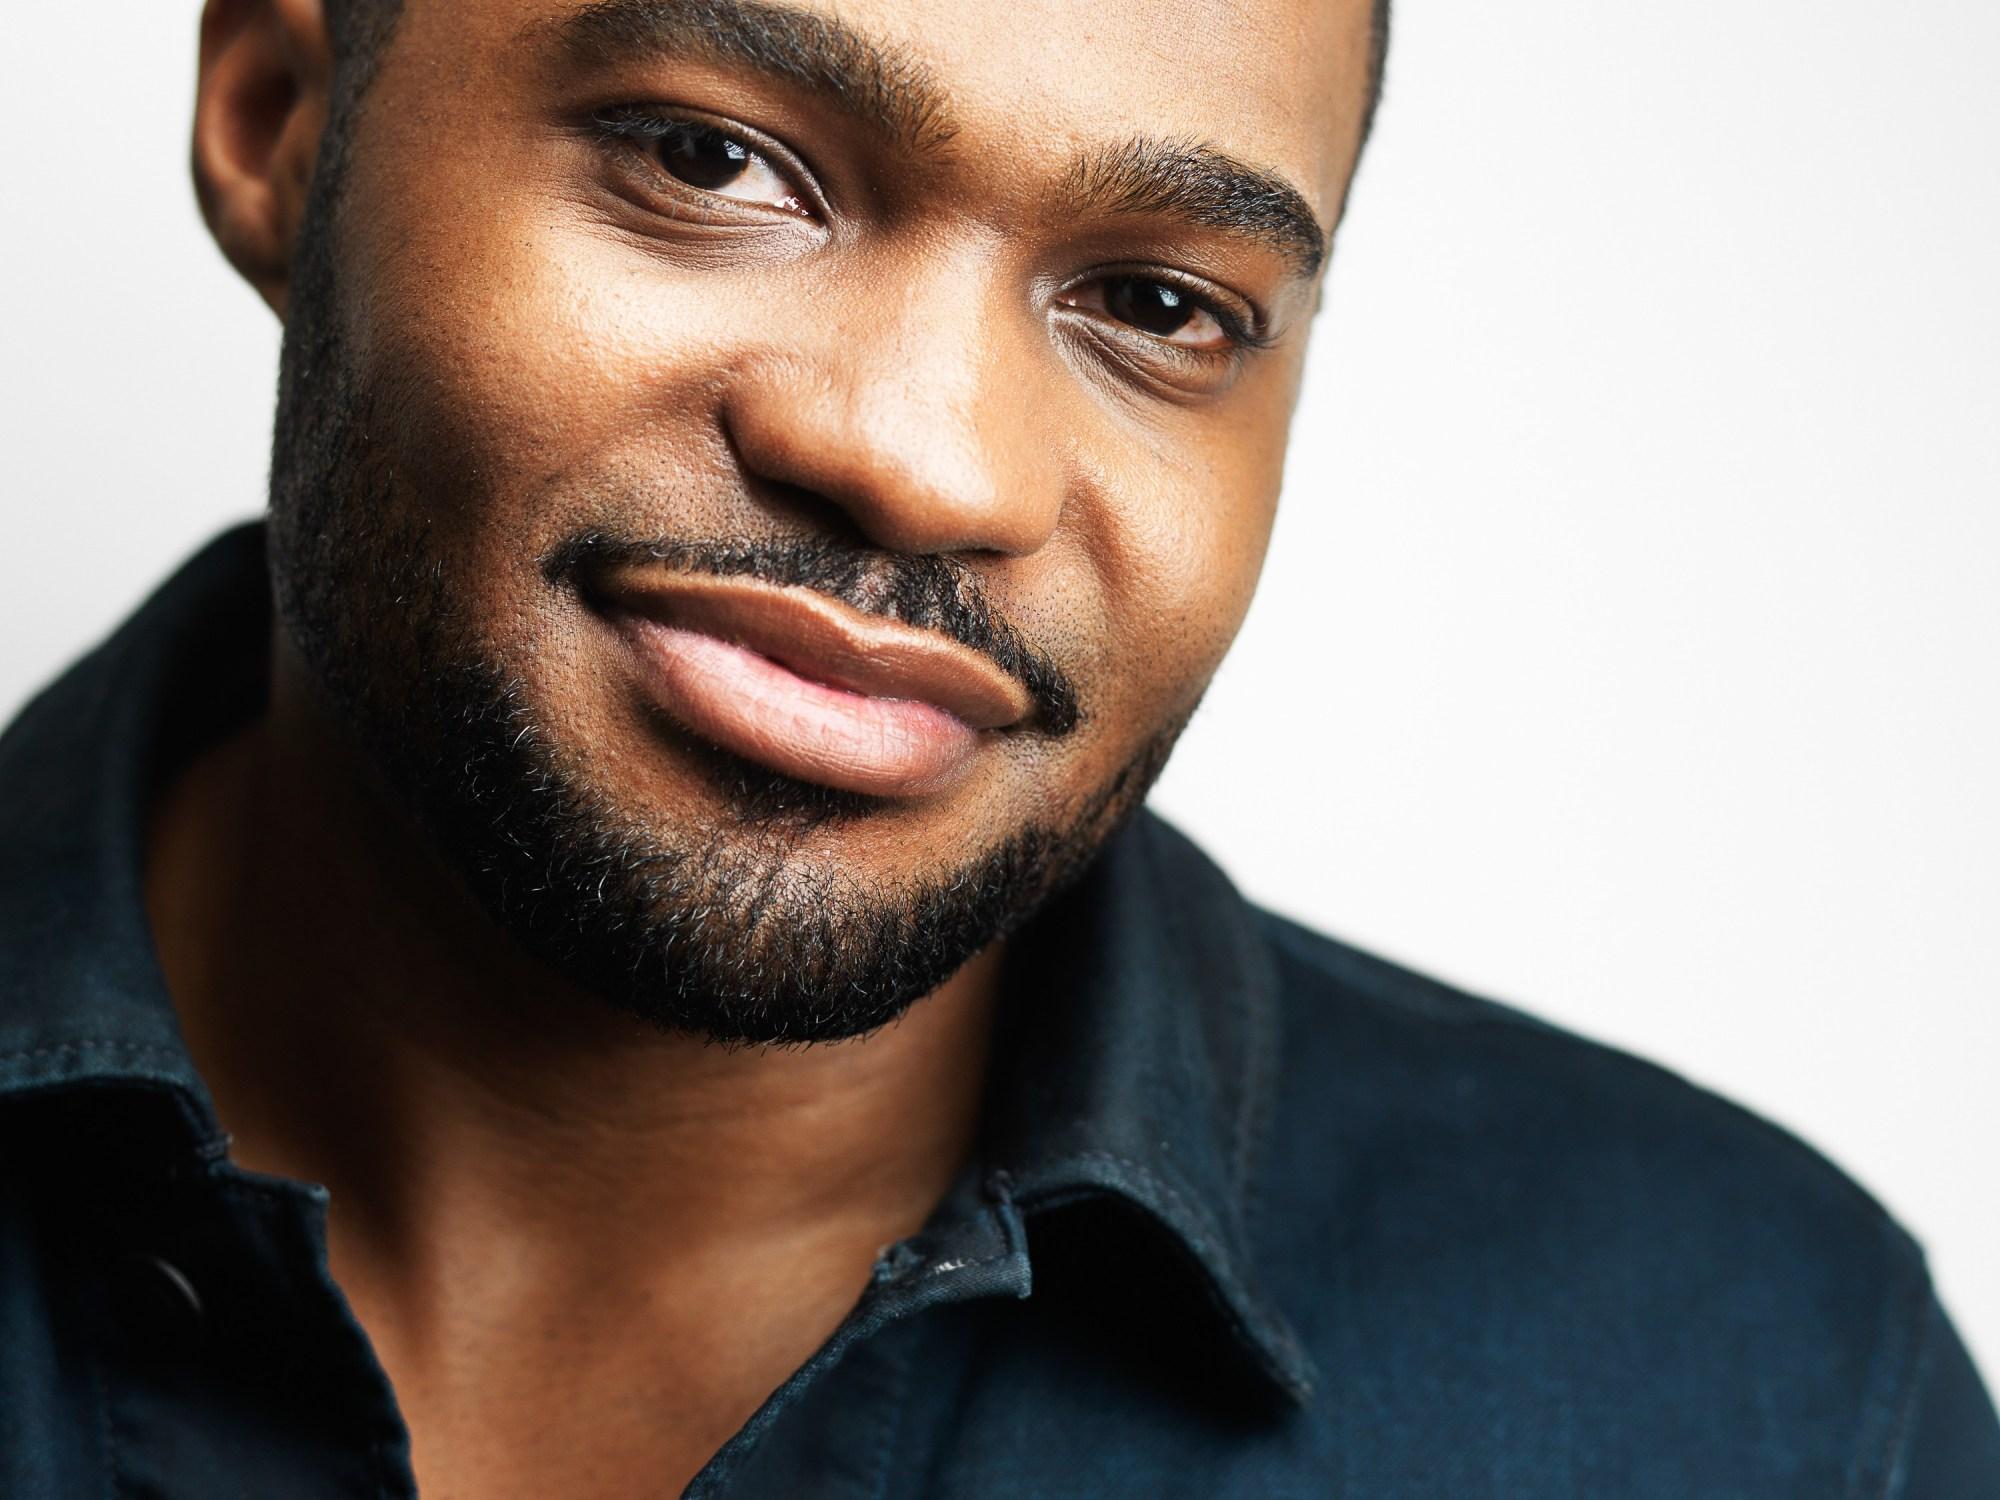 celebrities Tyrone Smith in Mavi Jeans Jacket shot by Jeffrey Mosier Photography